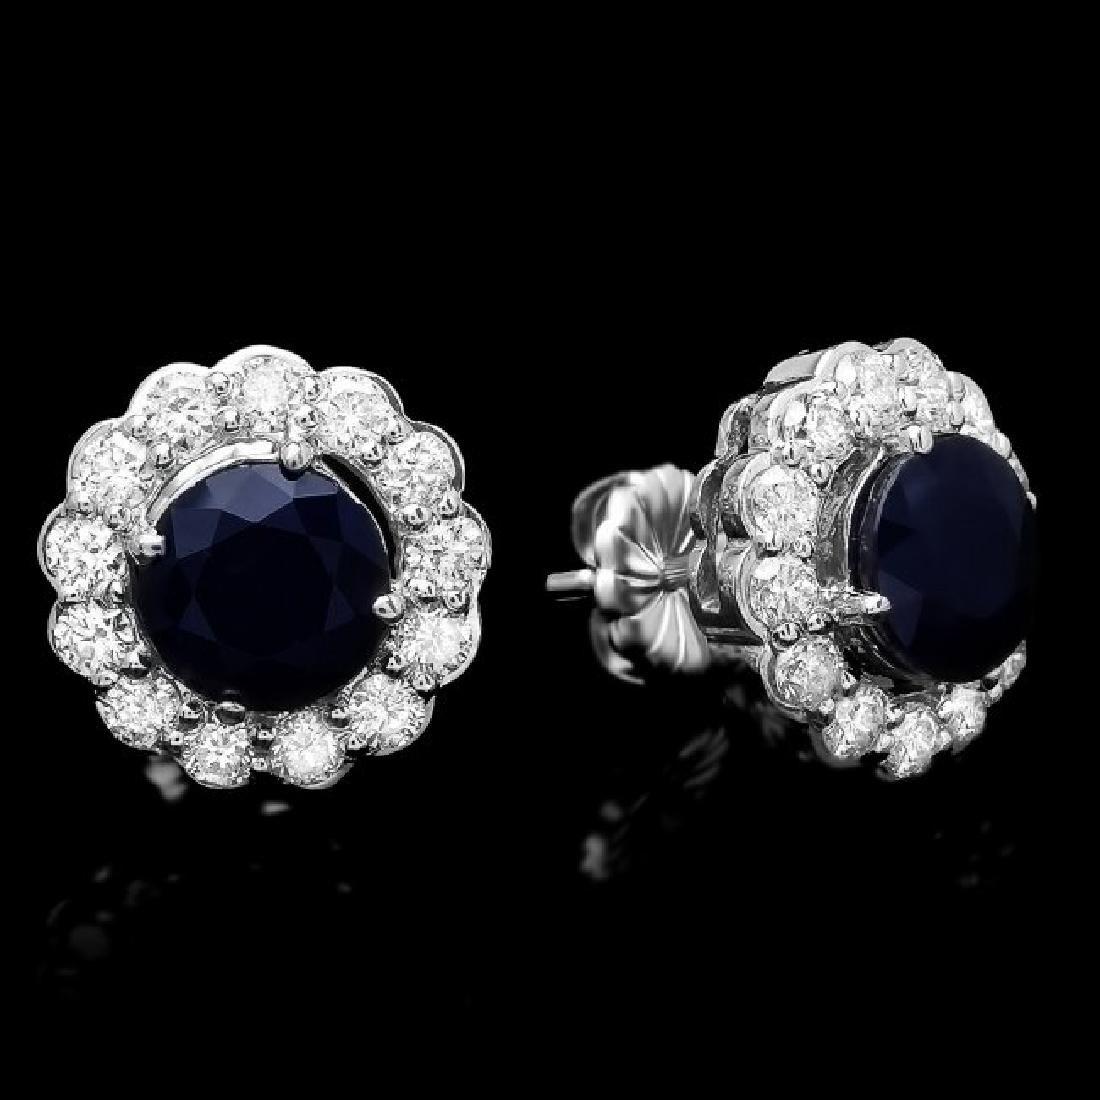 14k Gold 3.70ct Sapphire 1.5ct Diamond Earrings